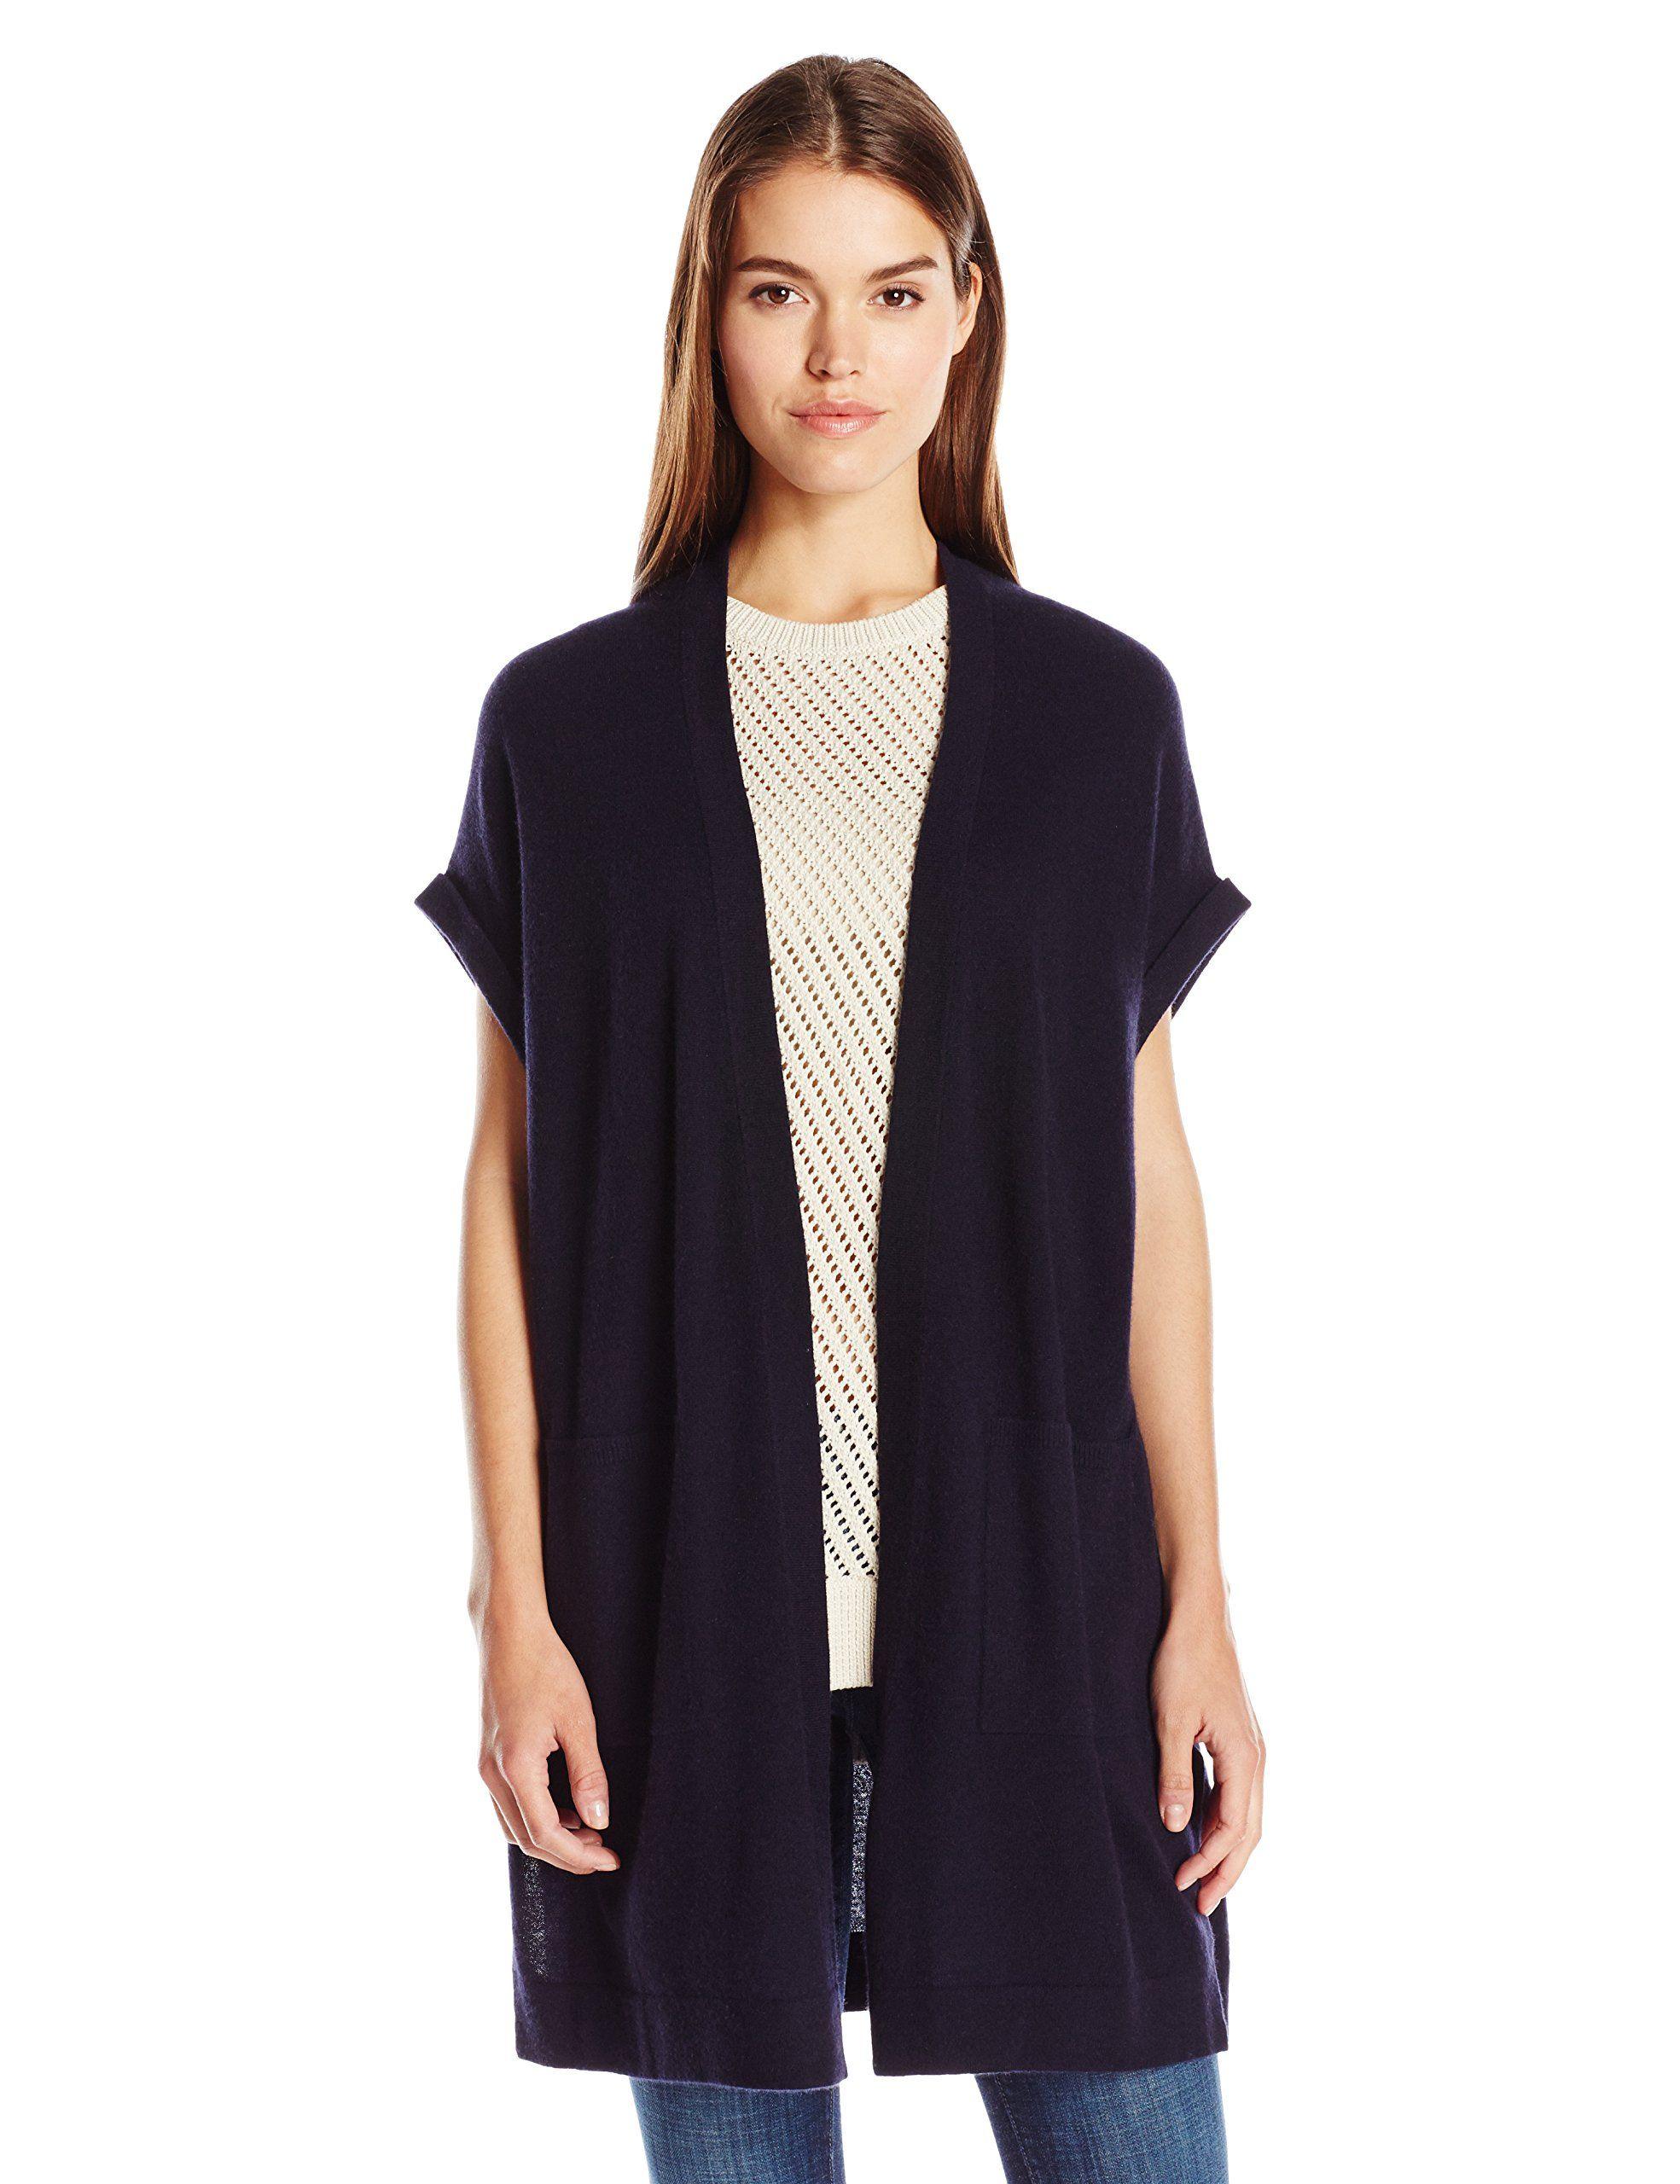 Vince Women's Sweater Vest, Coastal, X-Small. Signature Vince ...